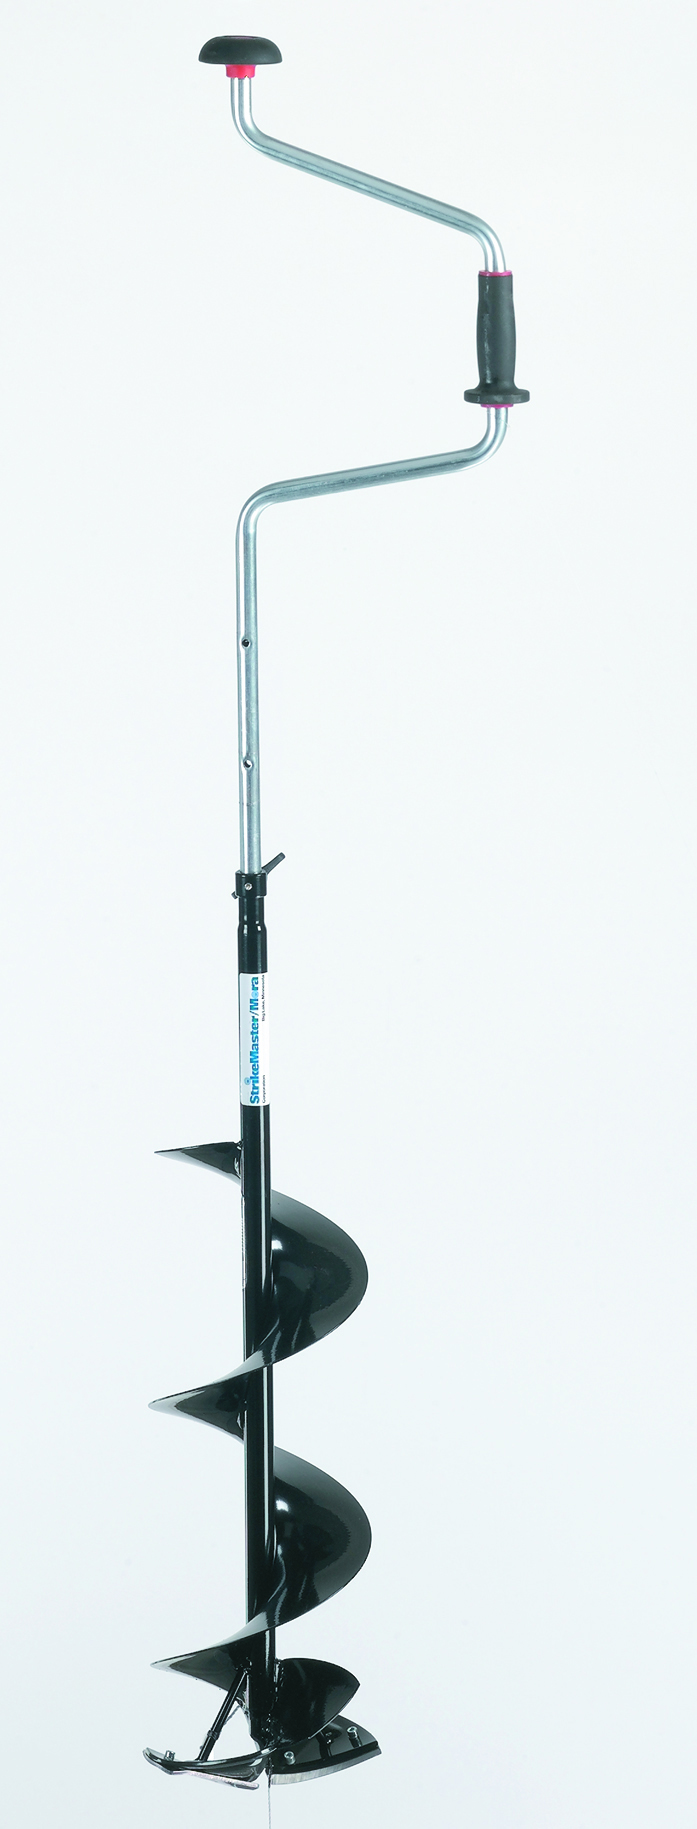 StrikeMaster LD-6 Lazer 2pc Hand Ice Auger 6